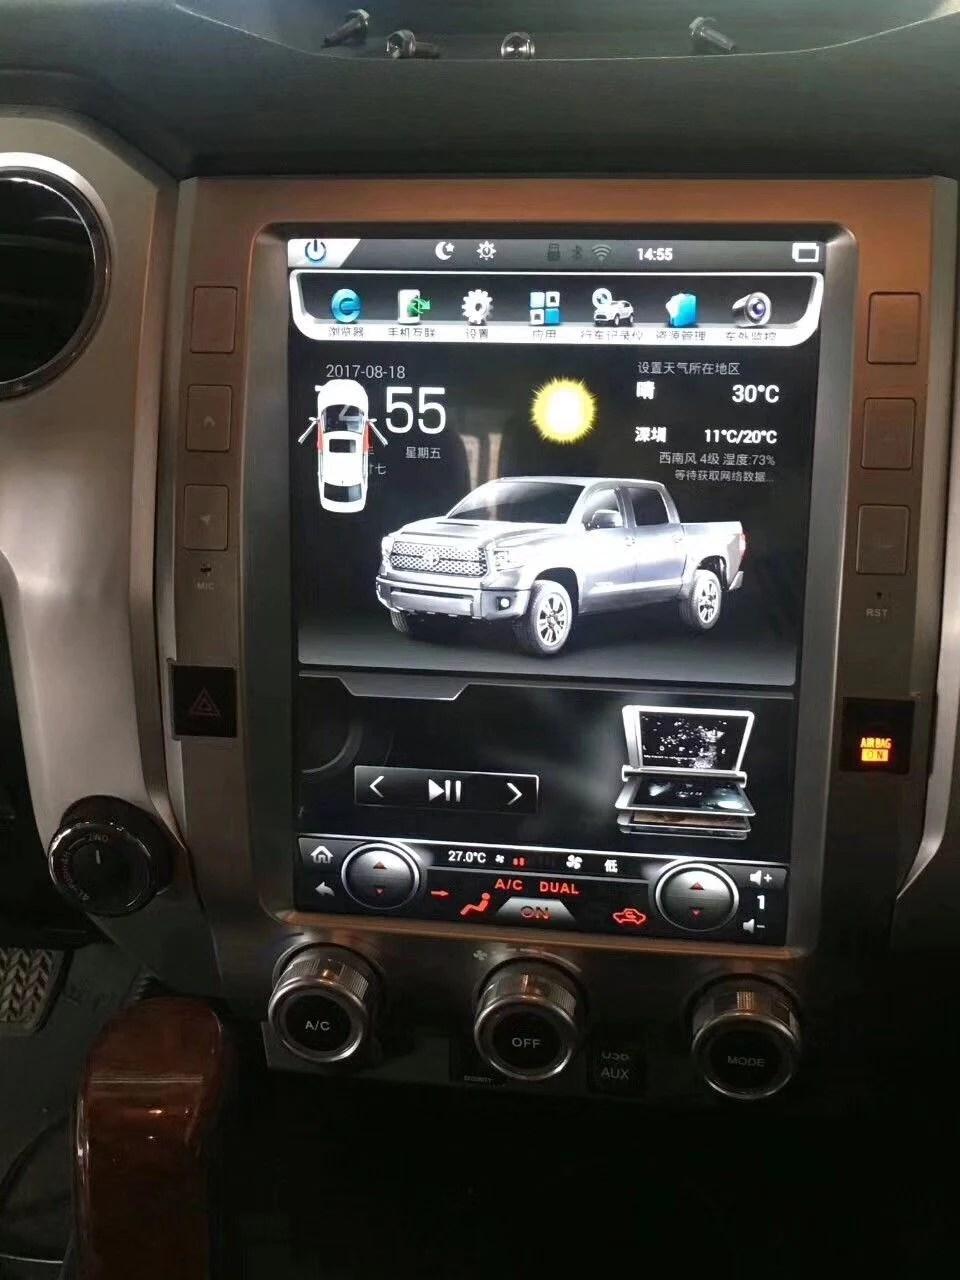 small resolution of rhino radios toyota tundra 2014 2017 12 1 vertical screen android radio